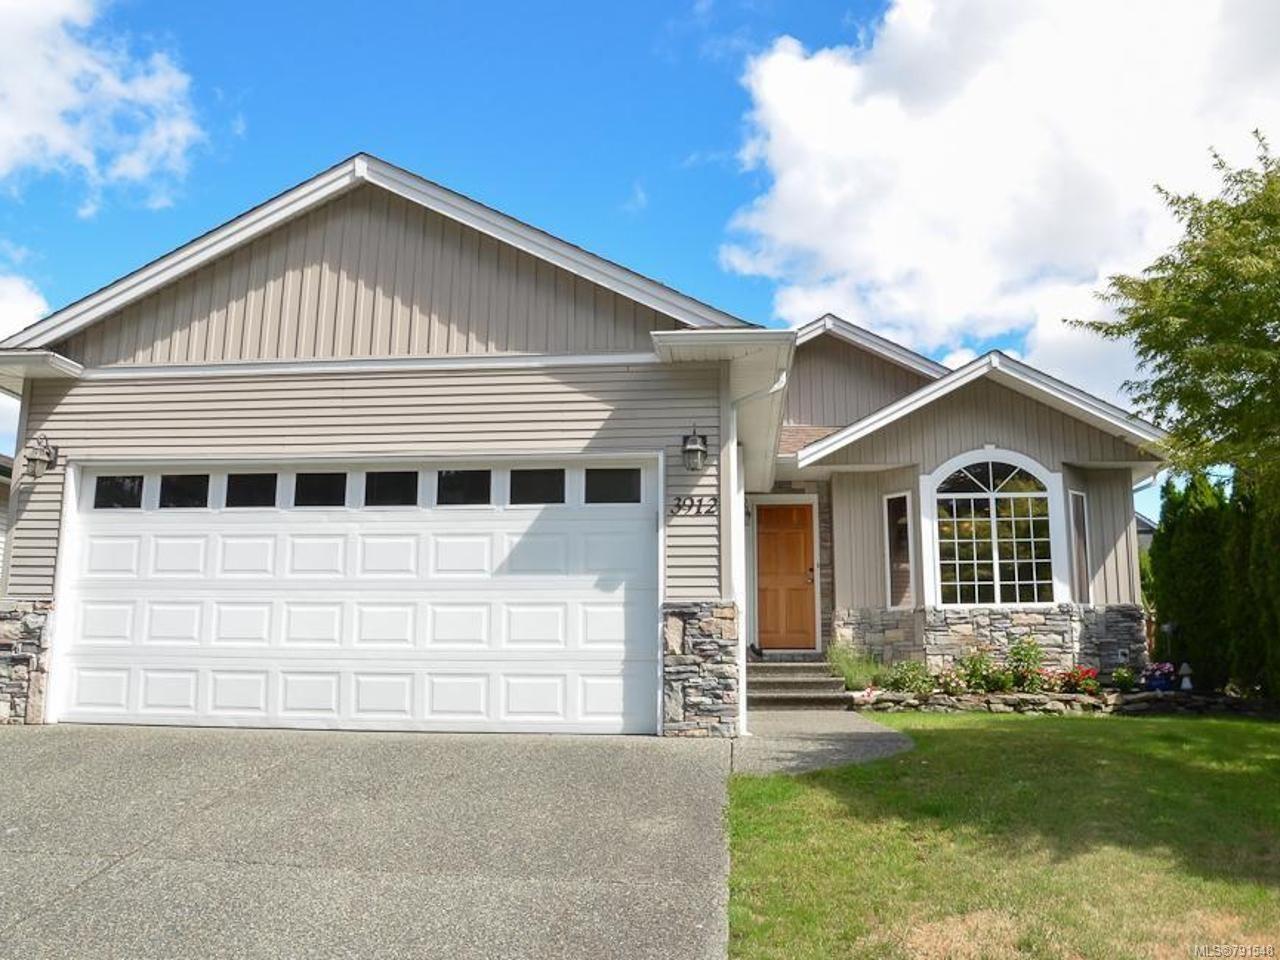 Main Photo: 102 3912 Merlin St in NANAIMO: Na North Jingle Pot Manufactured Home for sale (Nanaimo)  : MLS®# 791548